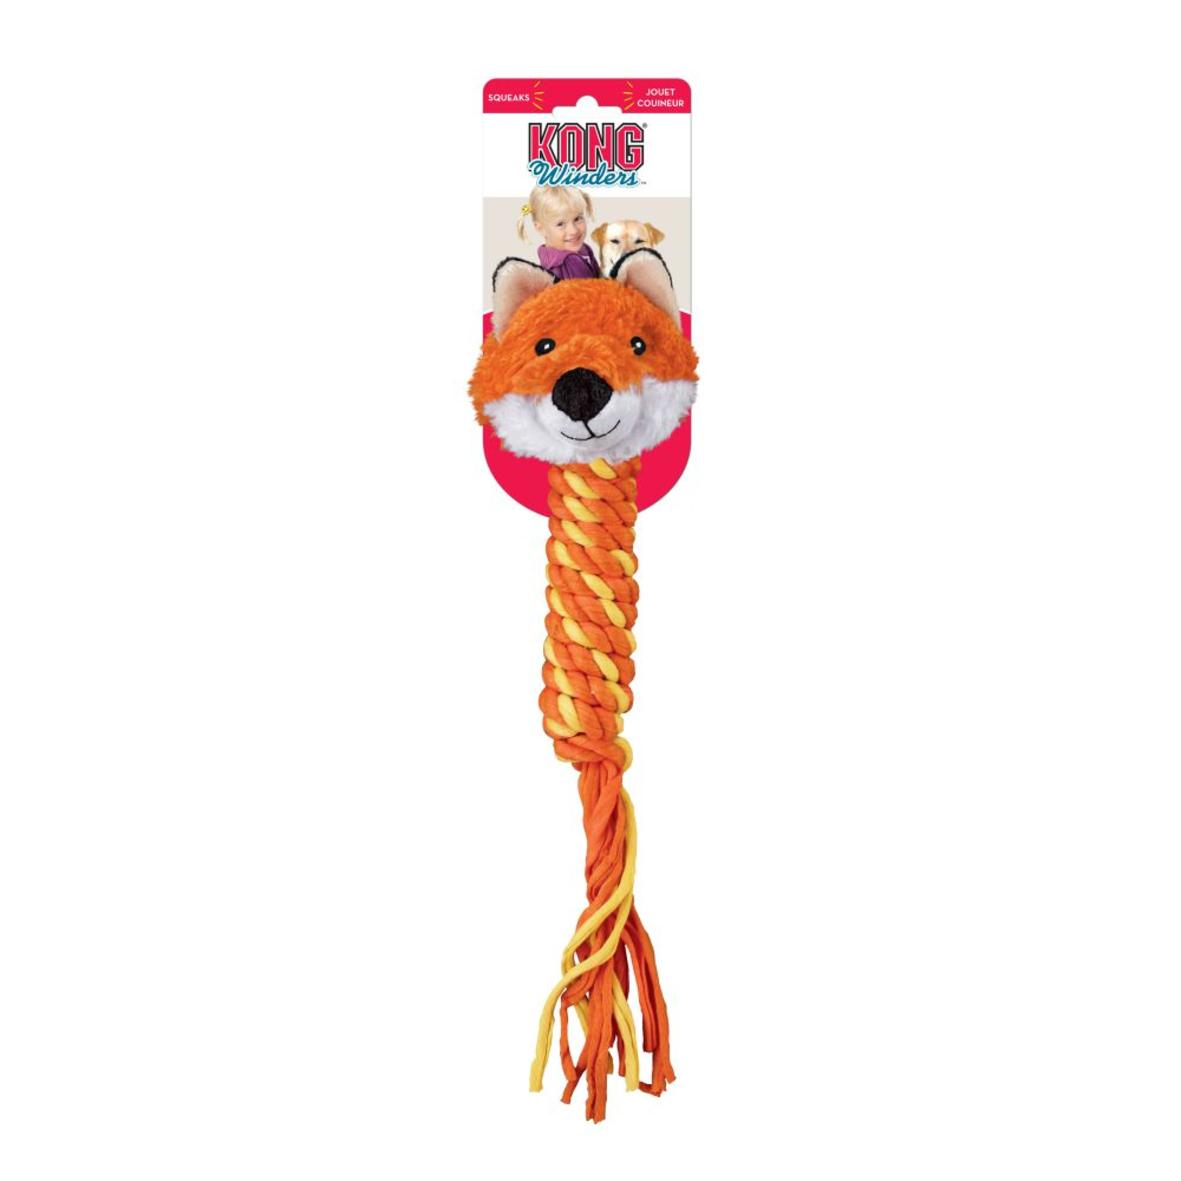 KONG Winders Fox Orange 41cm